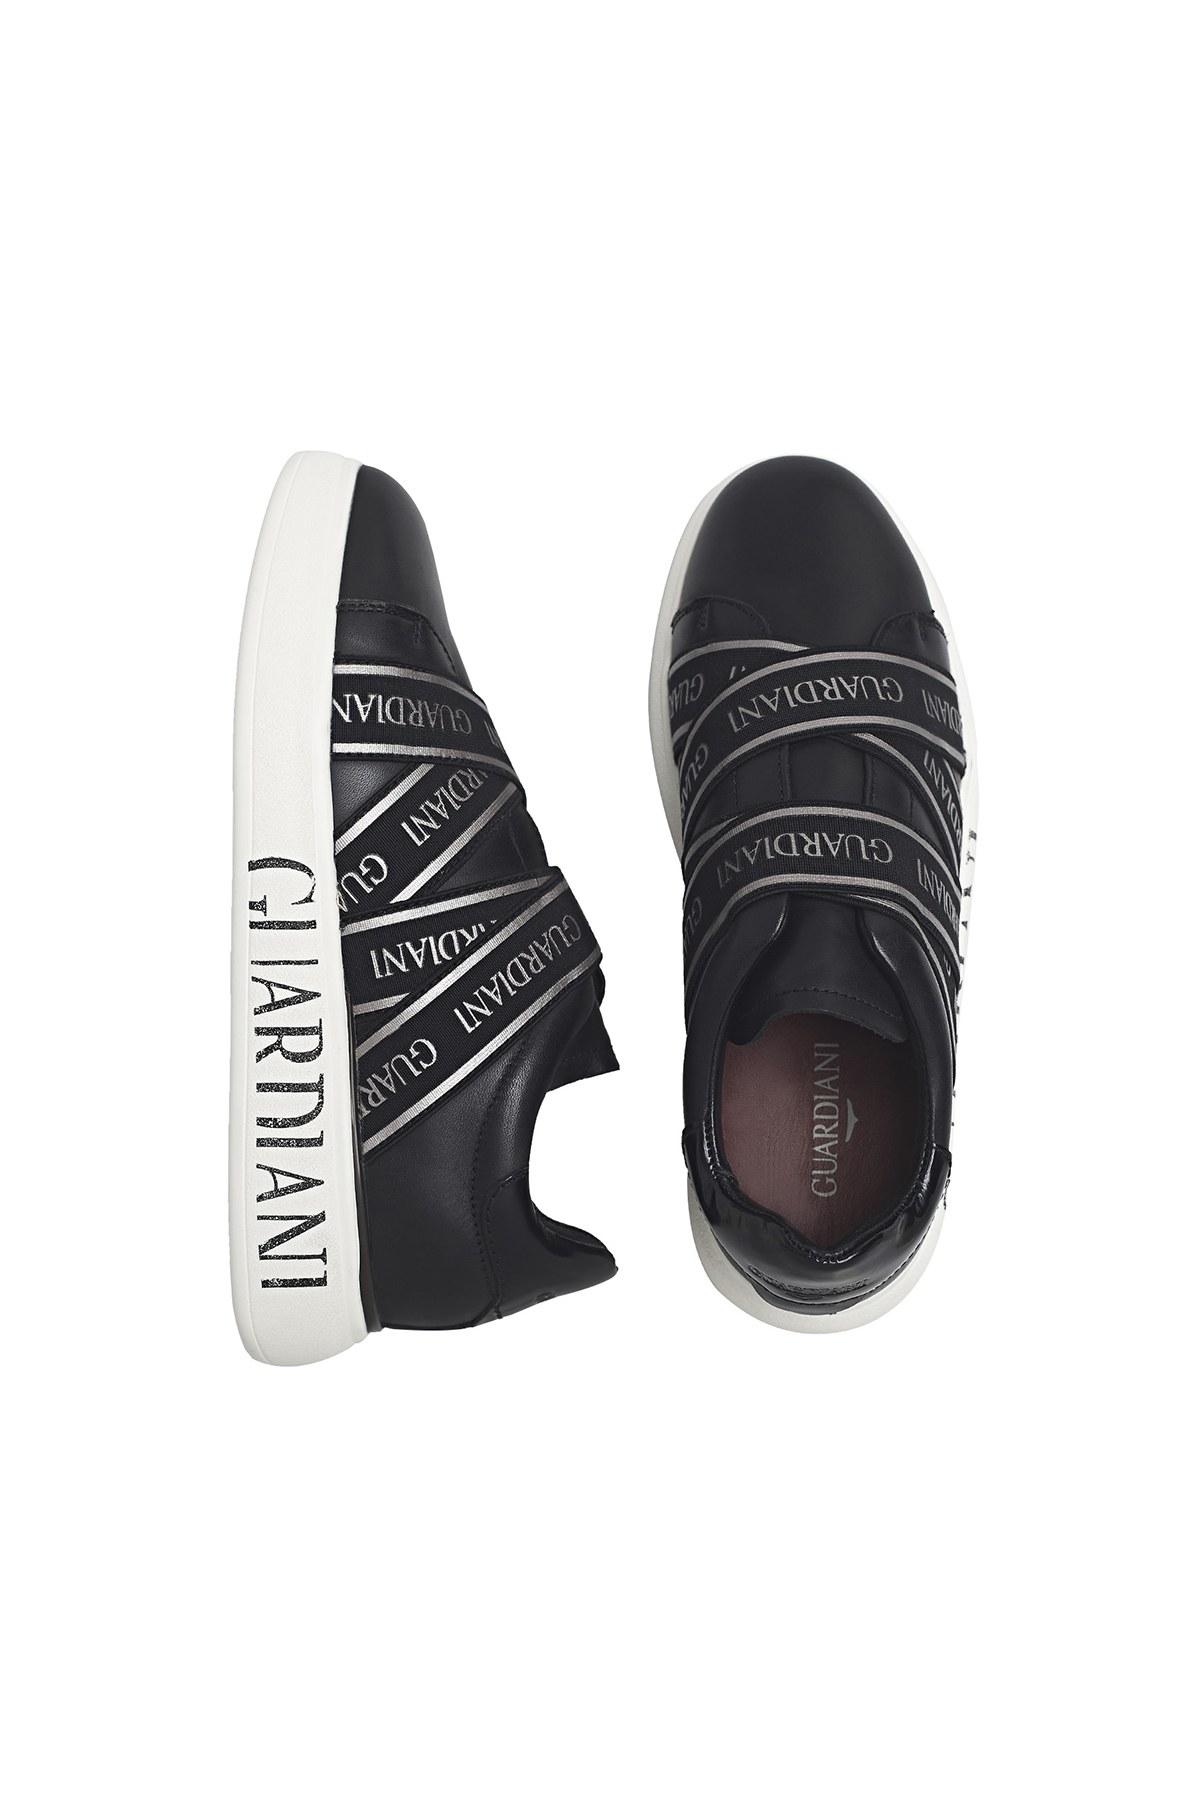 Alberto Guardiani Deri Bayan Ayakkabı AGW001500 SİYAH